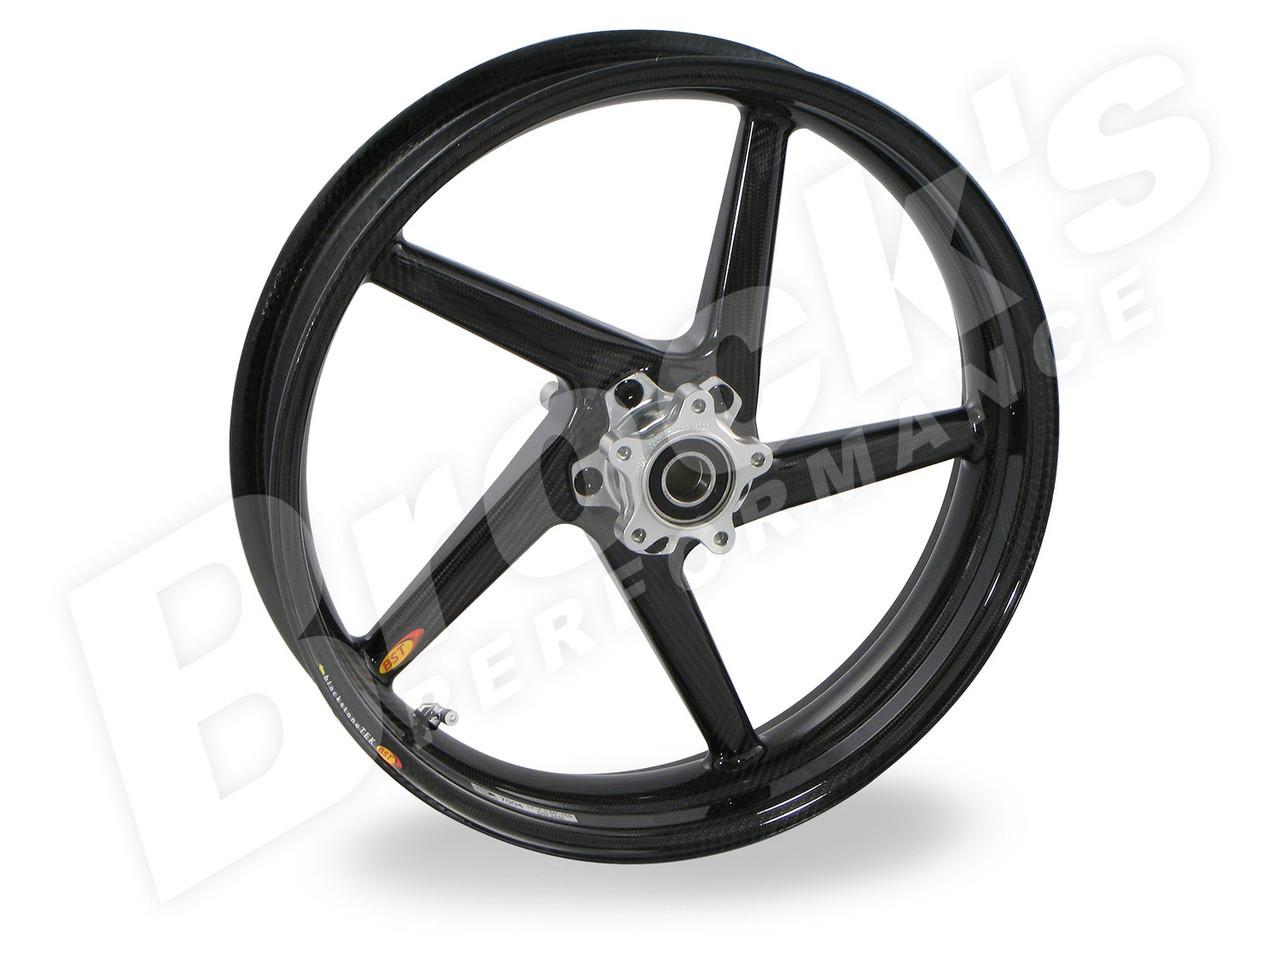 BST Front Wheel 3 5 x 17 for Benelli TNT / Tornado